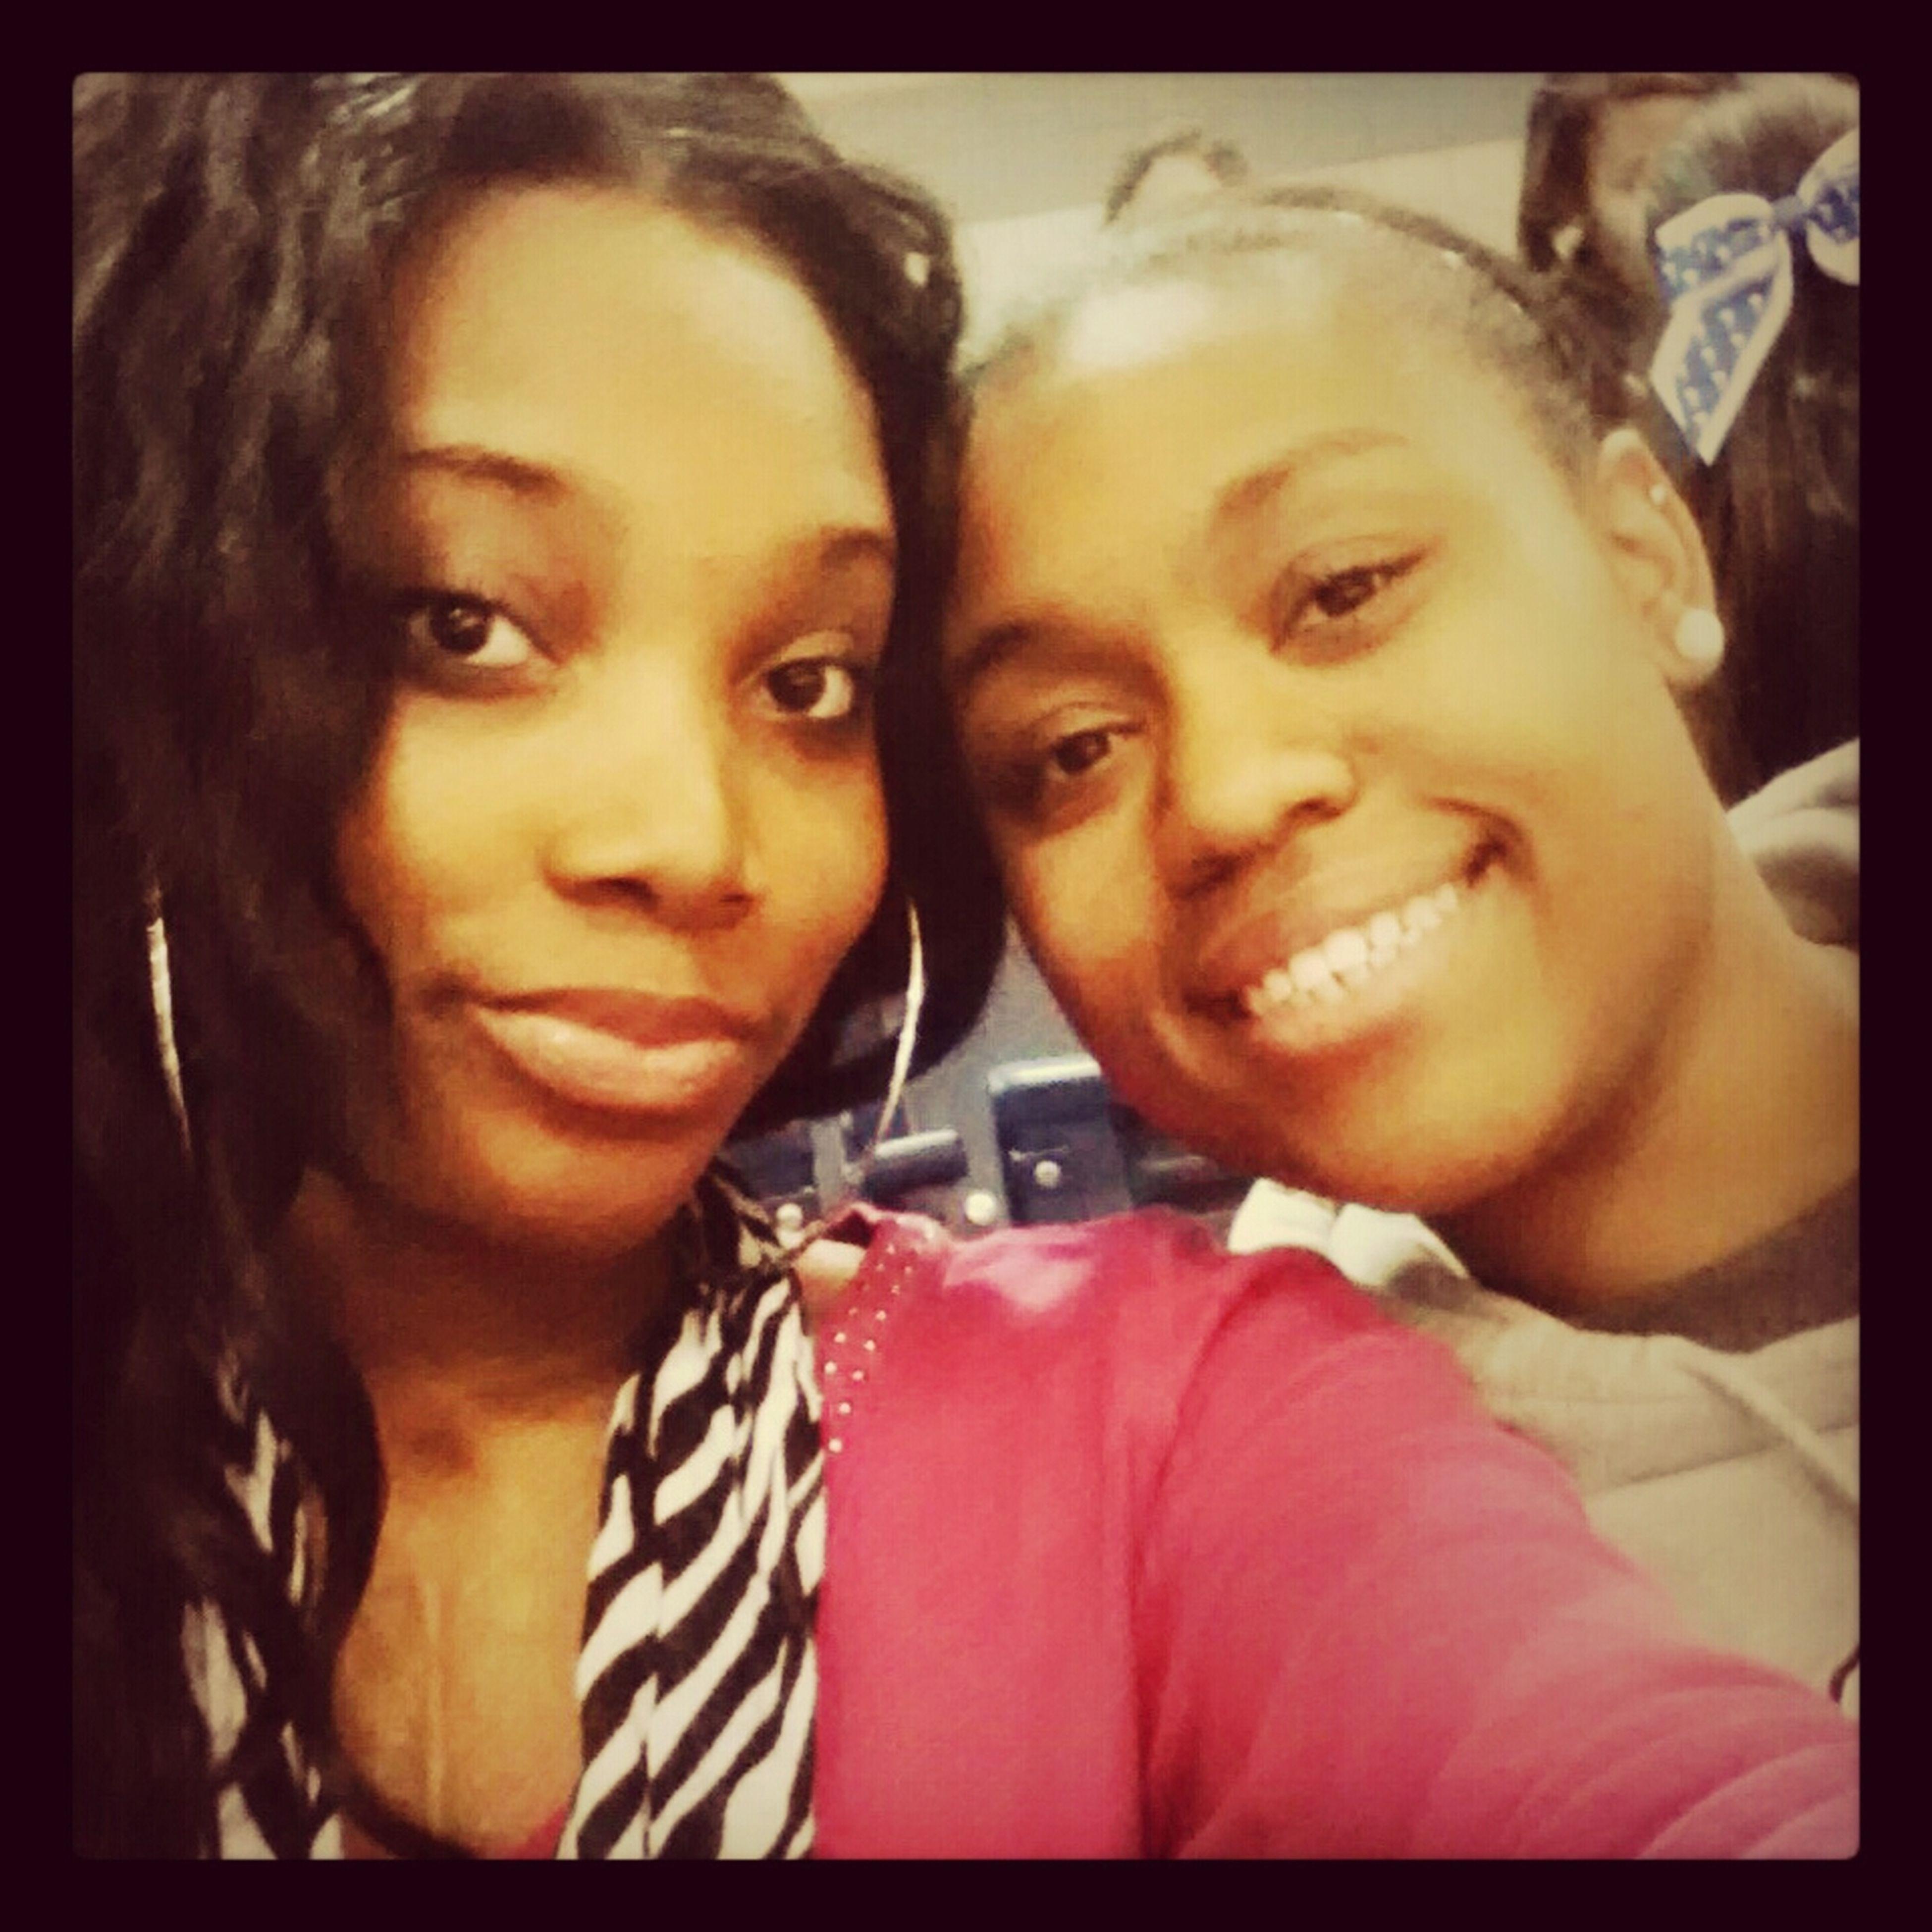 me and lybee last night :)